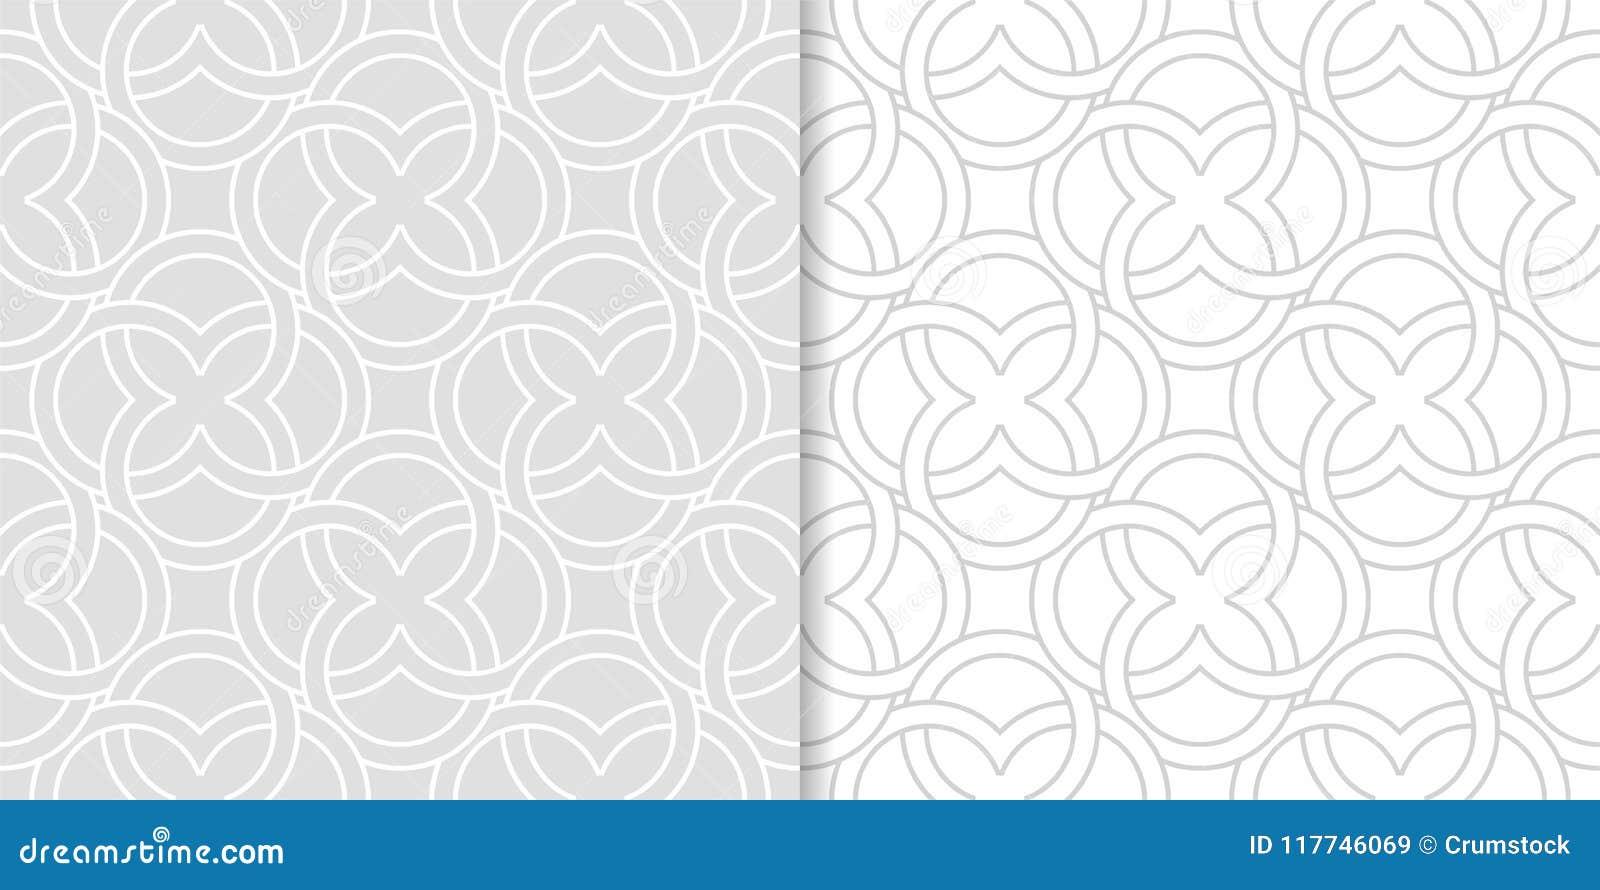 Light gray geometric ornaments. Set of seamless patterns